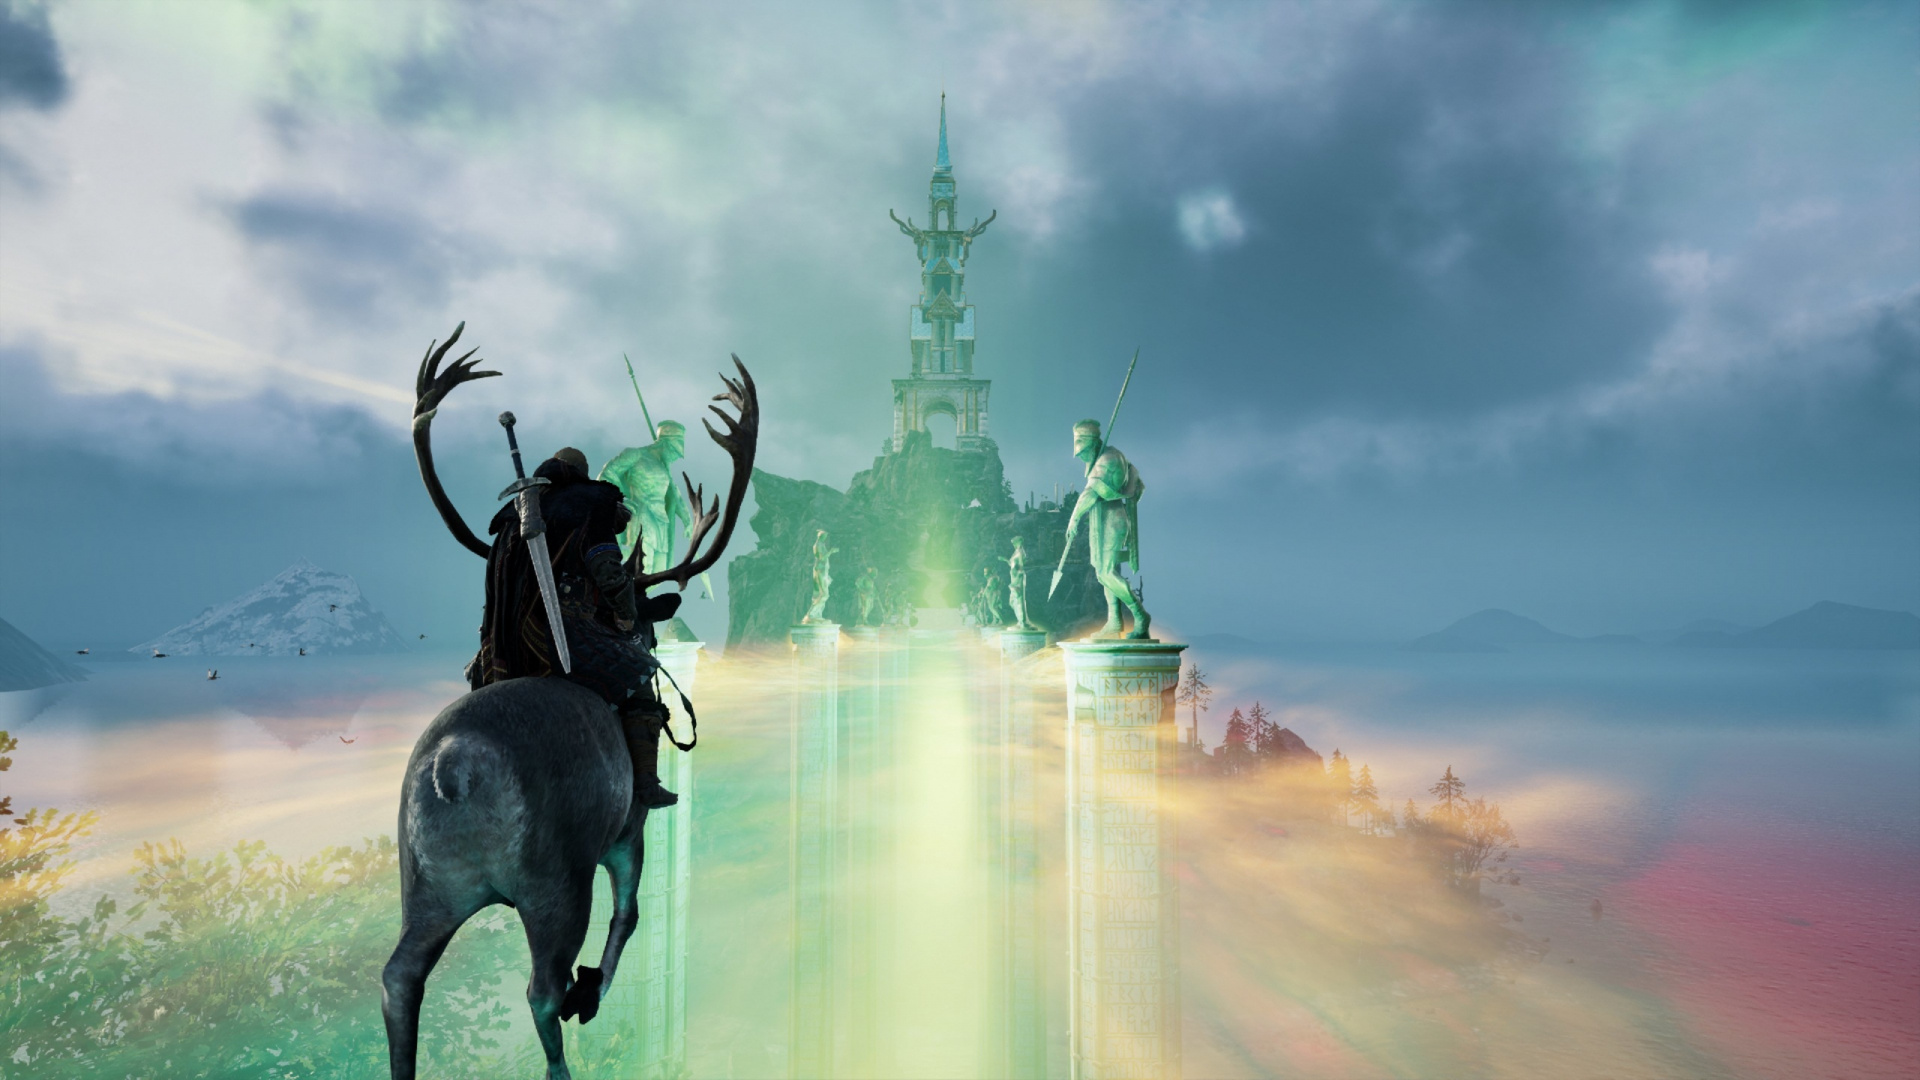 Ubisoft признала проблемы с апгрейдом Watch Dogs: Legion и Assassin's Creed Valhalla для PS5